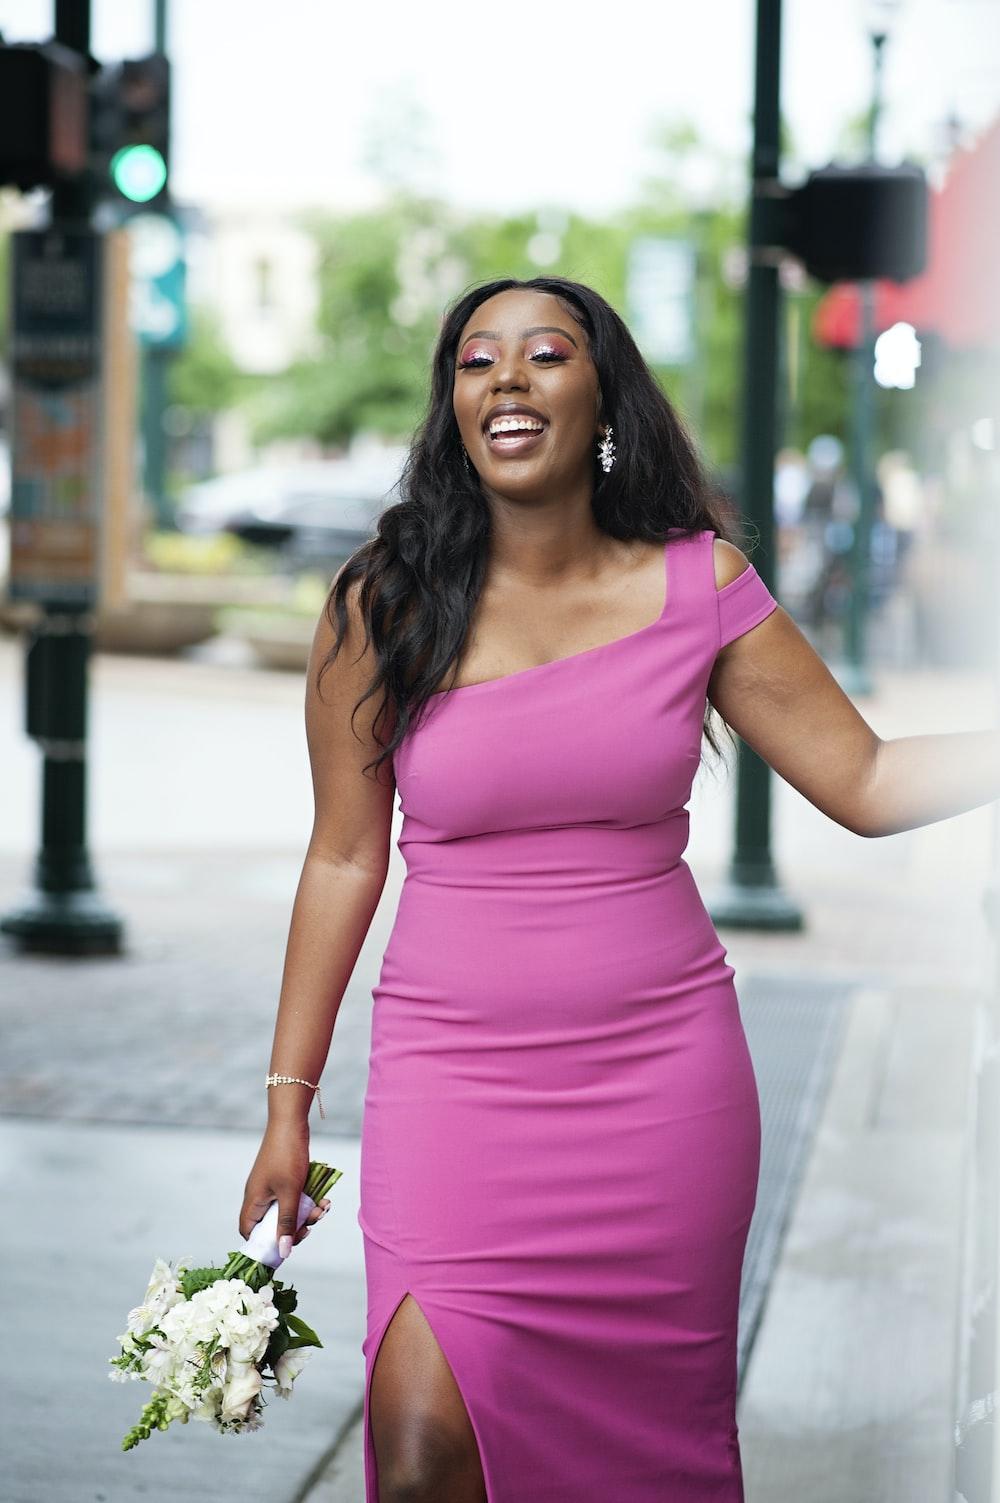 woman in pink sleeveless dress standing on sidewalk during daytime